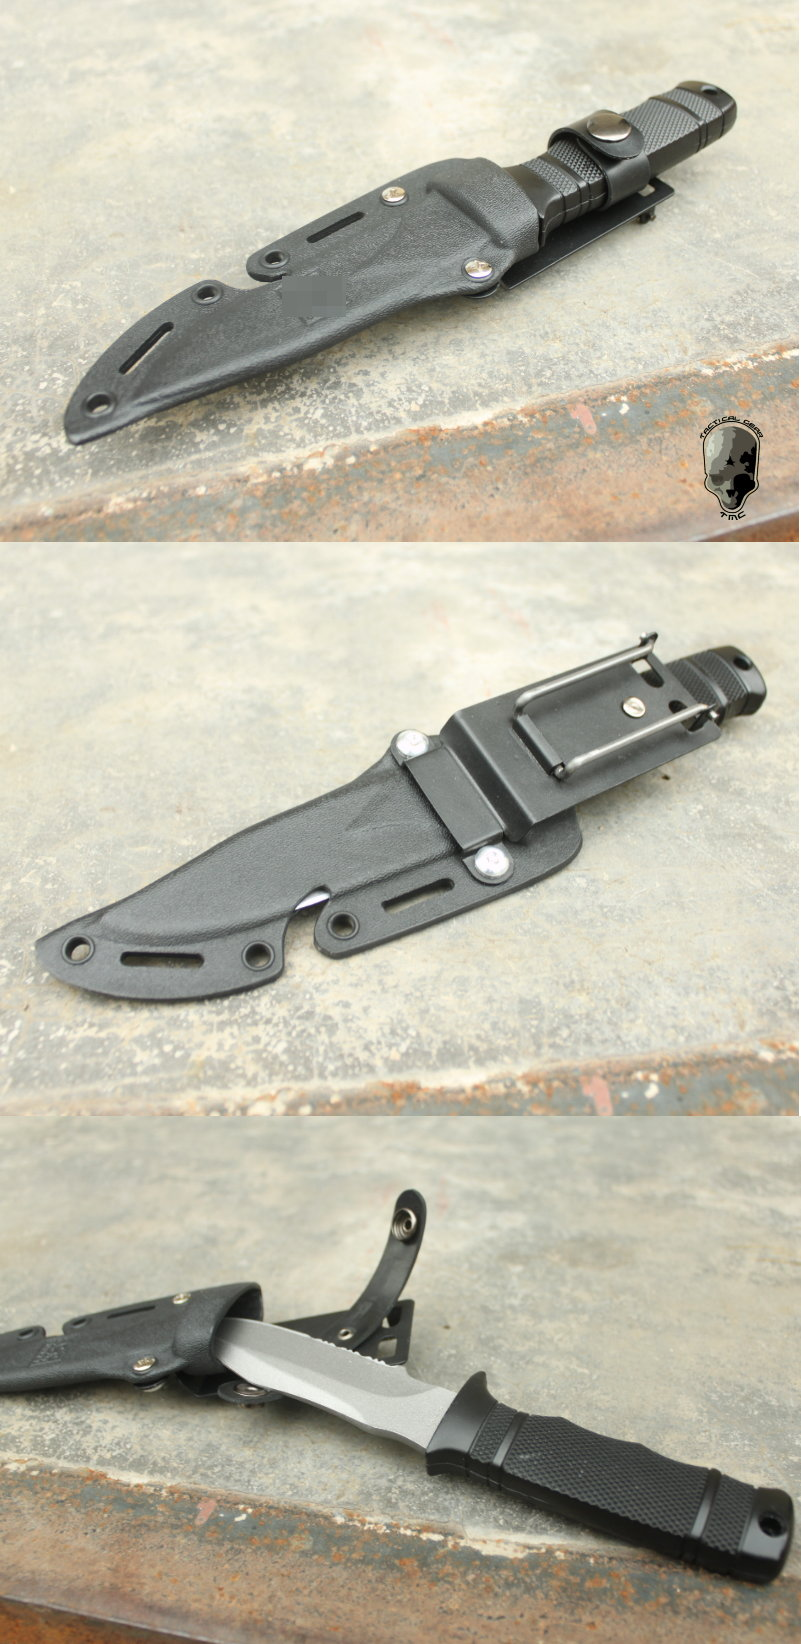 G TMC Dummy M37-K Seal Pup Knife ( BK ) TMC-M37-BK (couteau de combat abs) TMC%20Dummy%20M37-K%20Seal%20Pup%20Knife%20a